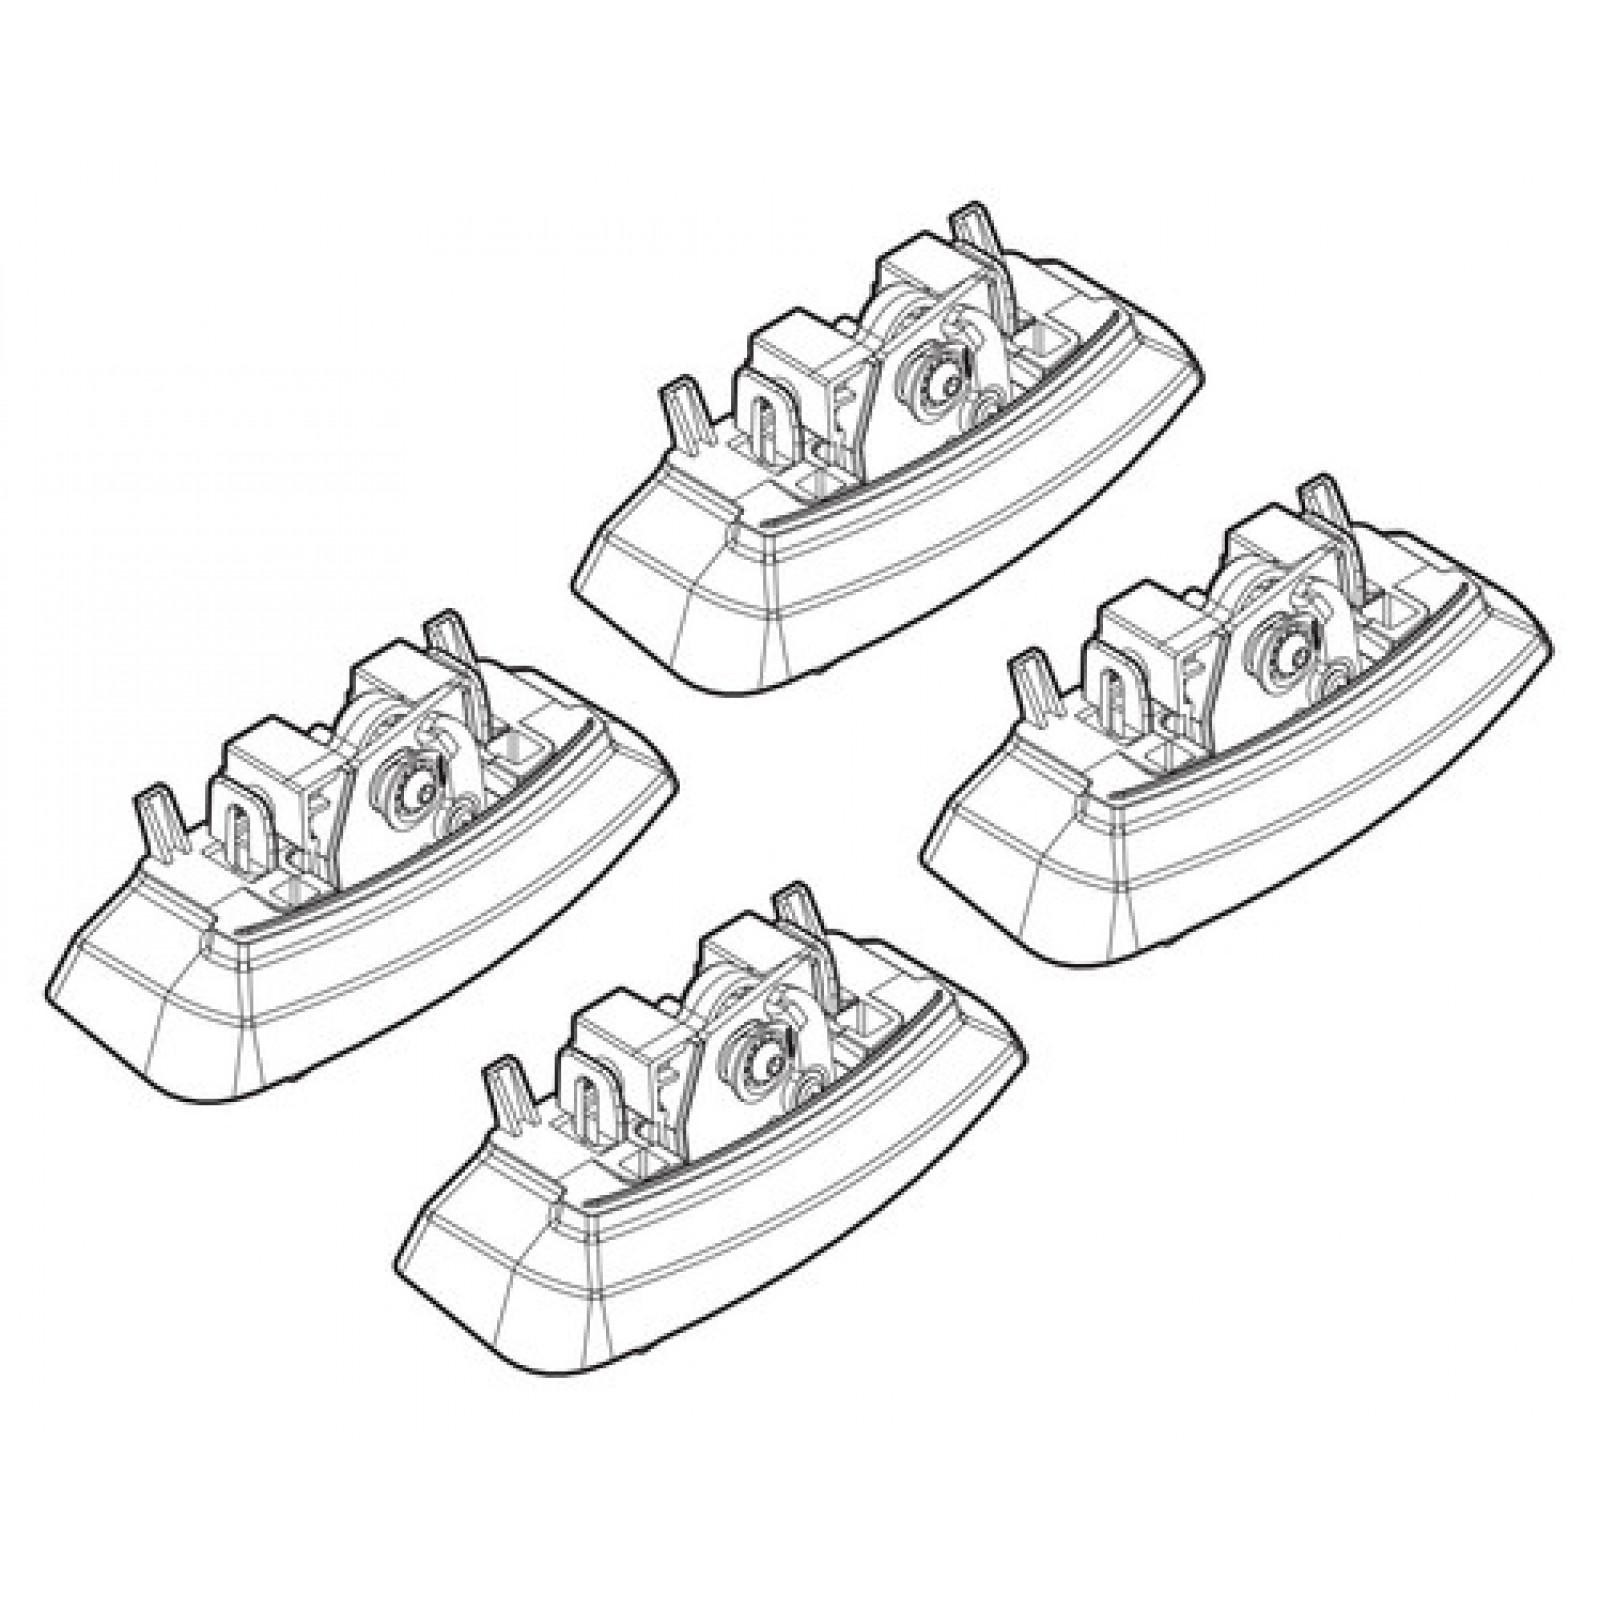 barres de toit pour opel meriva. Black Bedroom Furniture Sets. Home Design Ideas